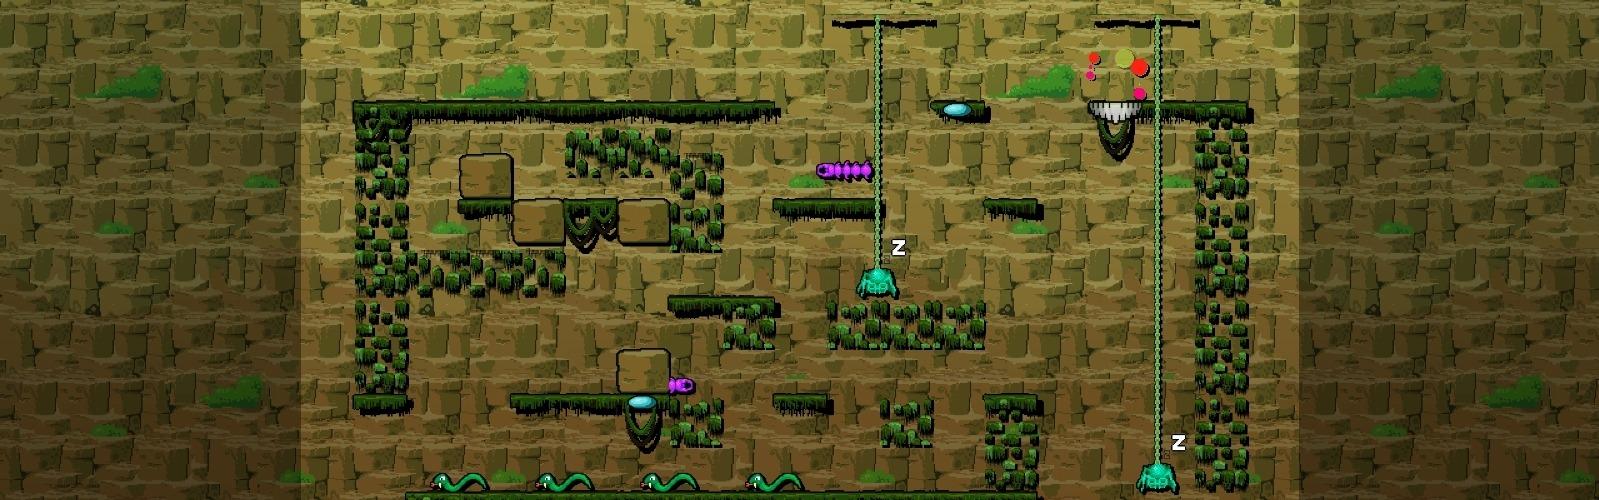 Dino Eggs: Rebirth Steam Key GLOBAL